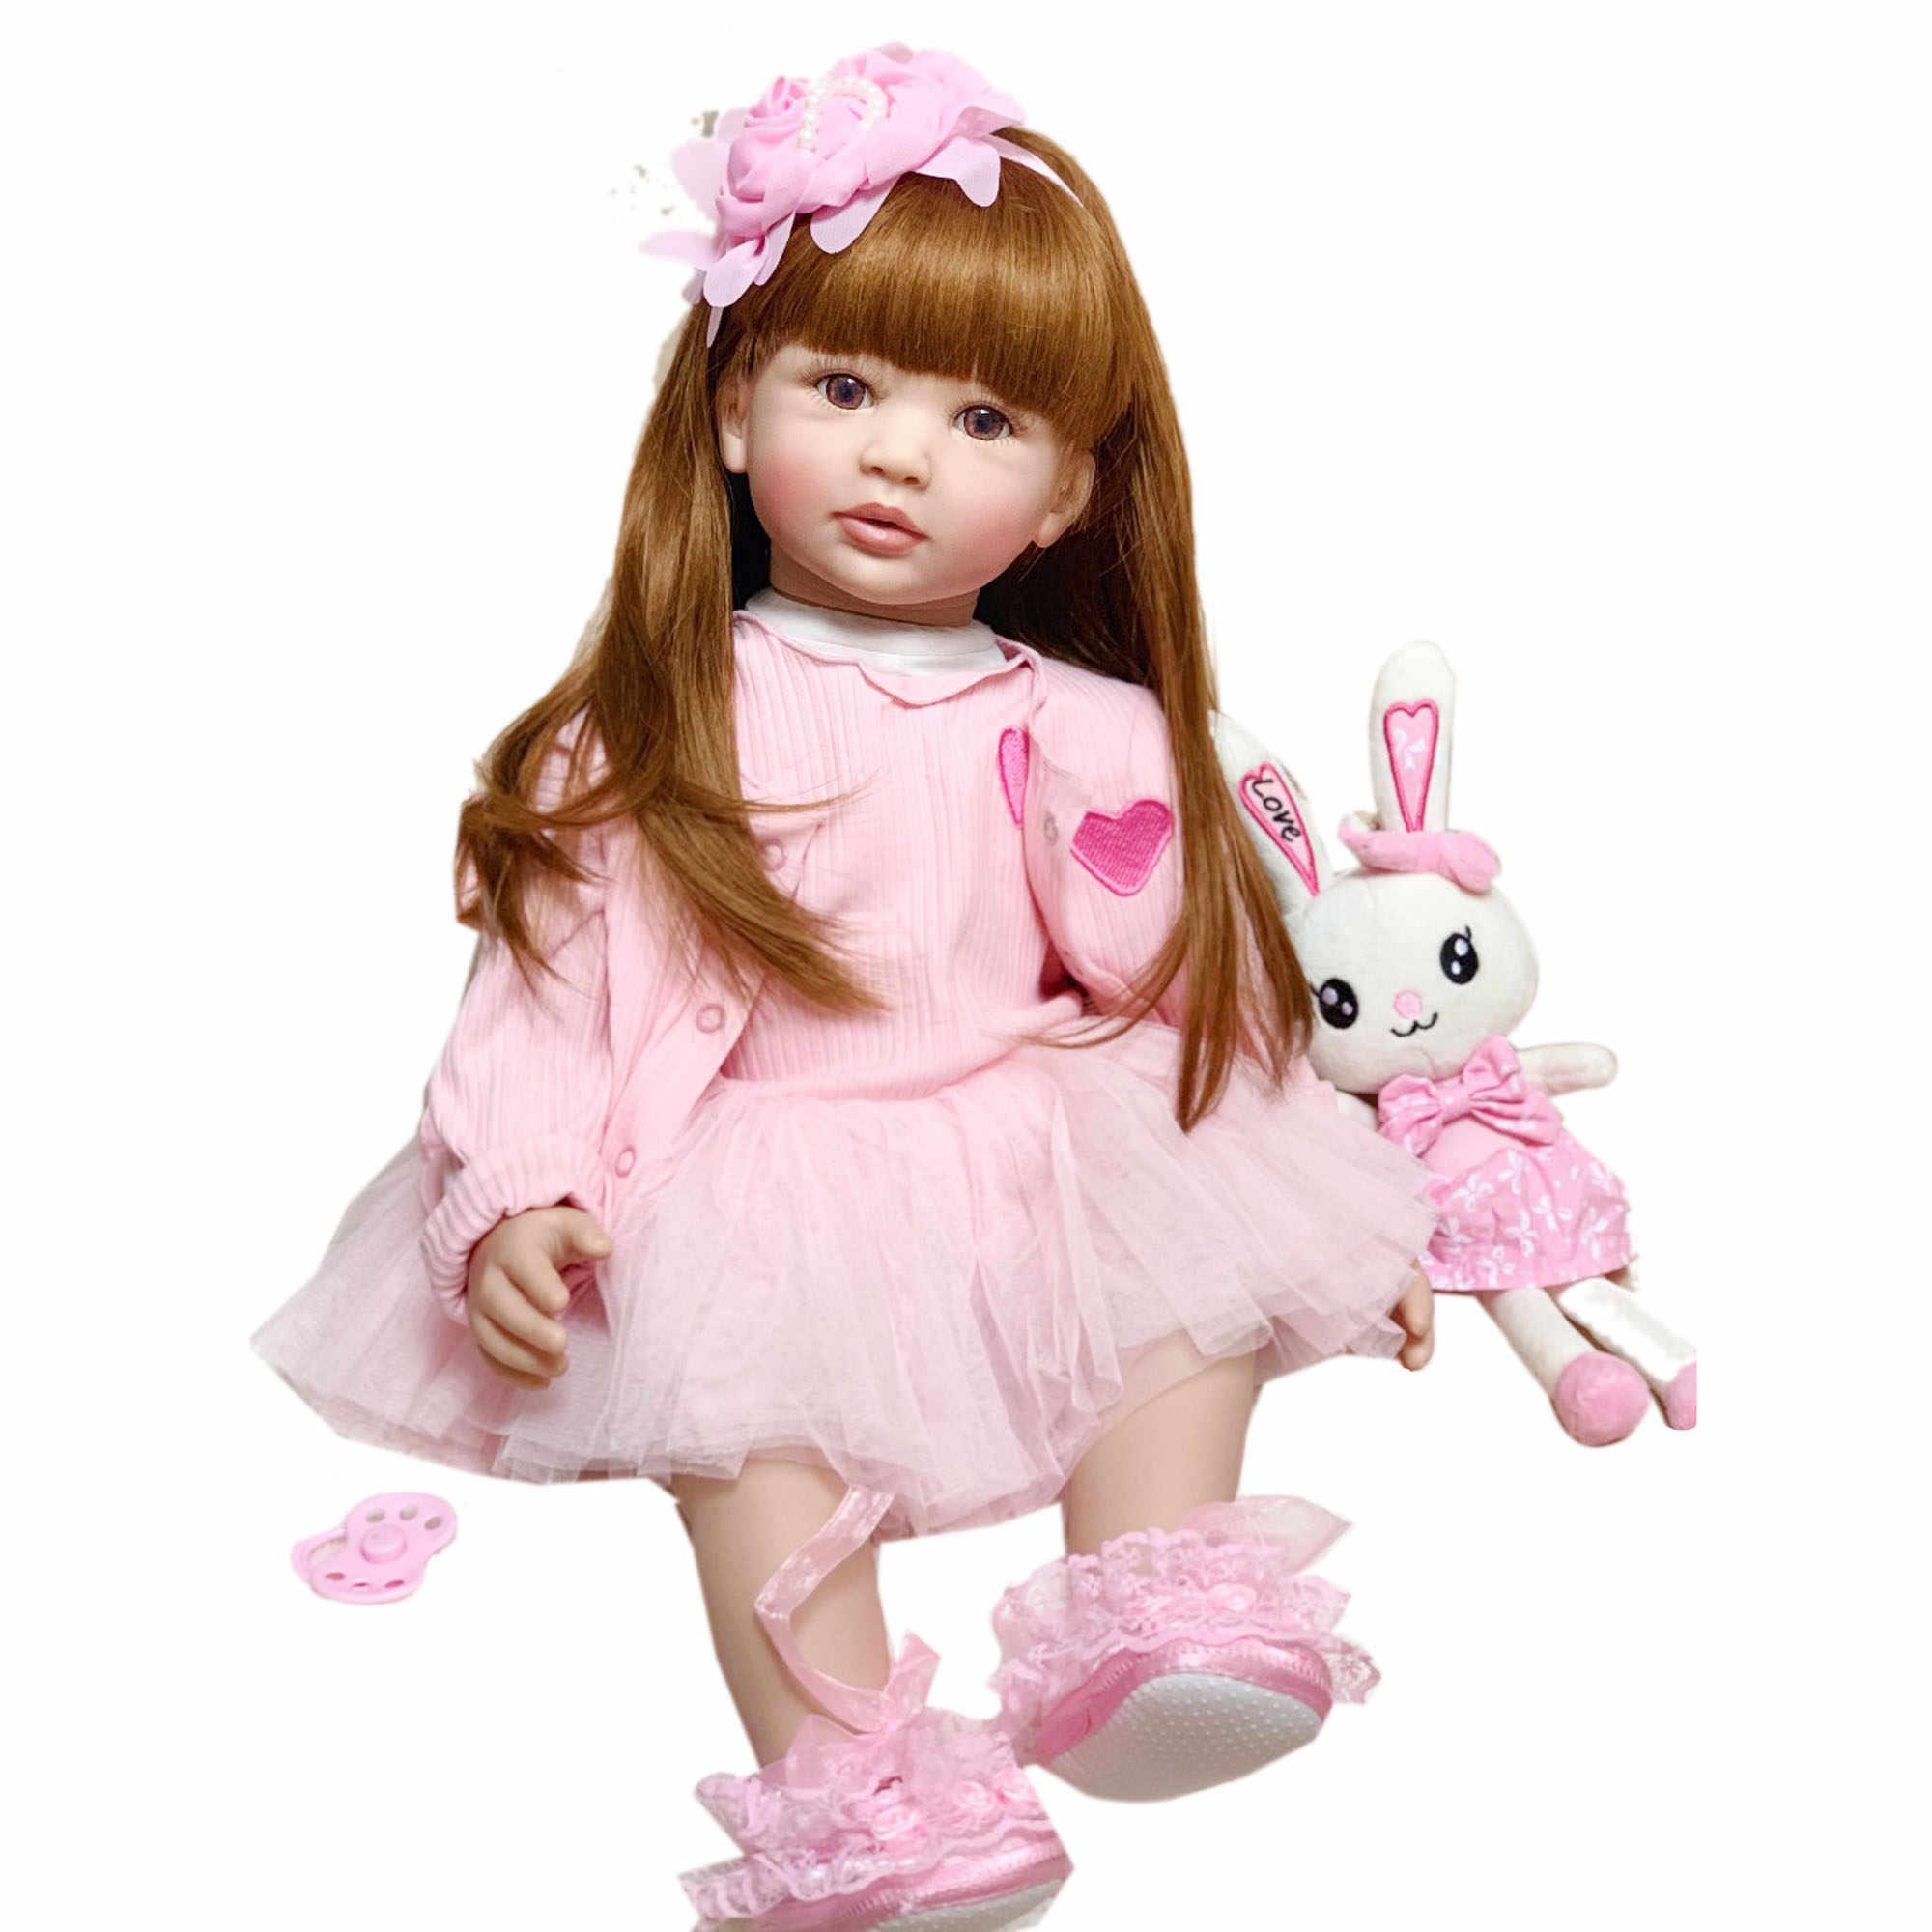 "24/"" Beautiful Simulation Baby Long-Haired Toddler Girl Lifelike Newborn Bebe Toy"